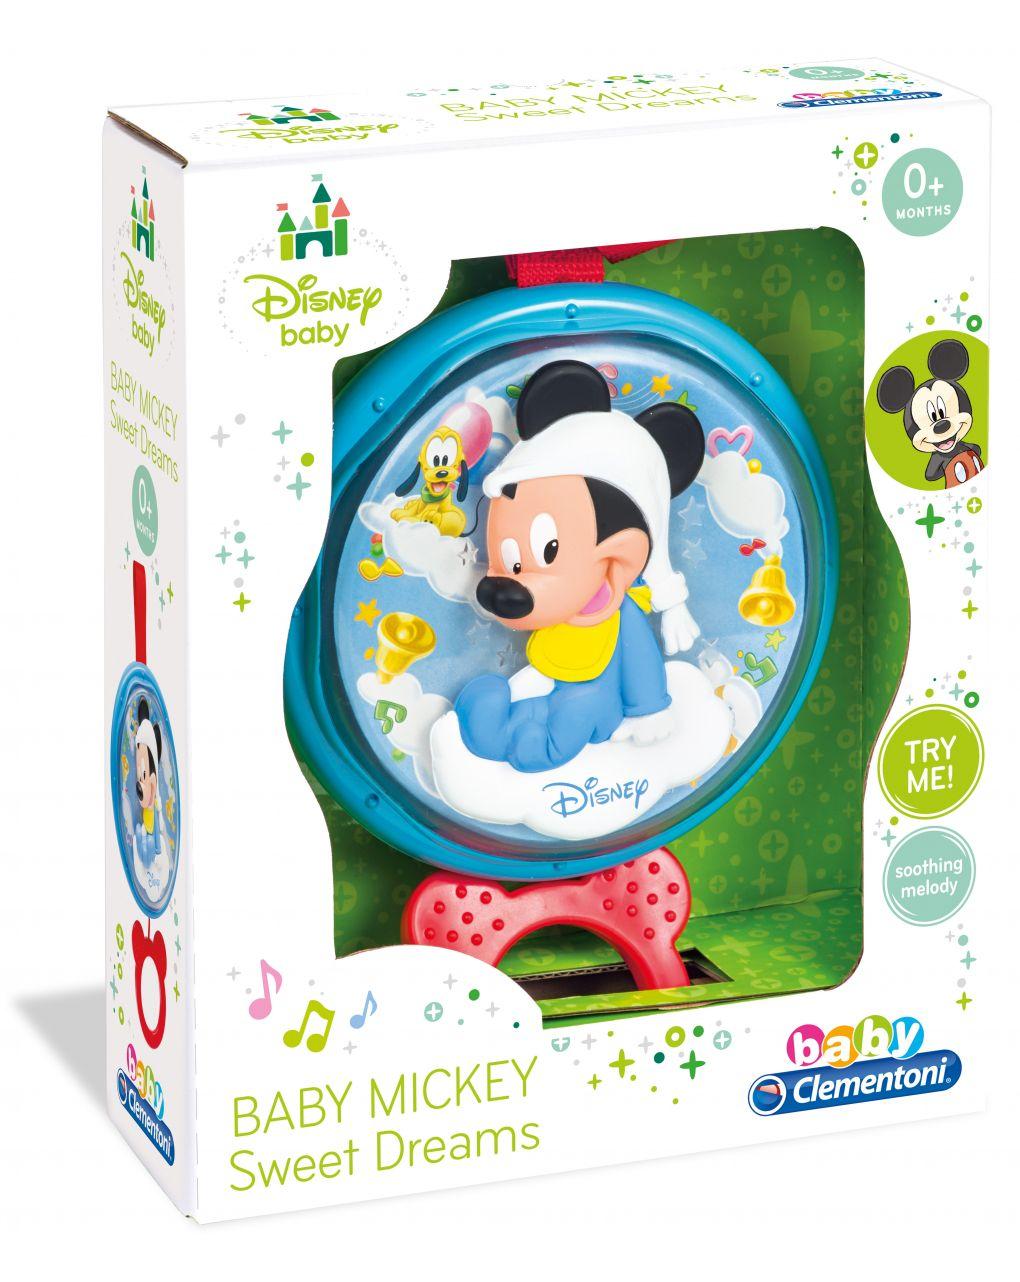 Disney baby - topolino carillon dolce notte - Clementoni